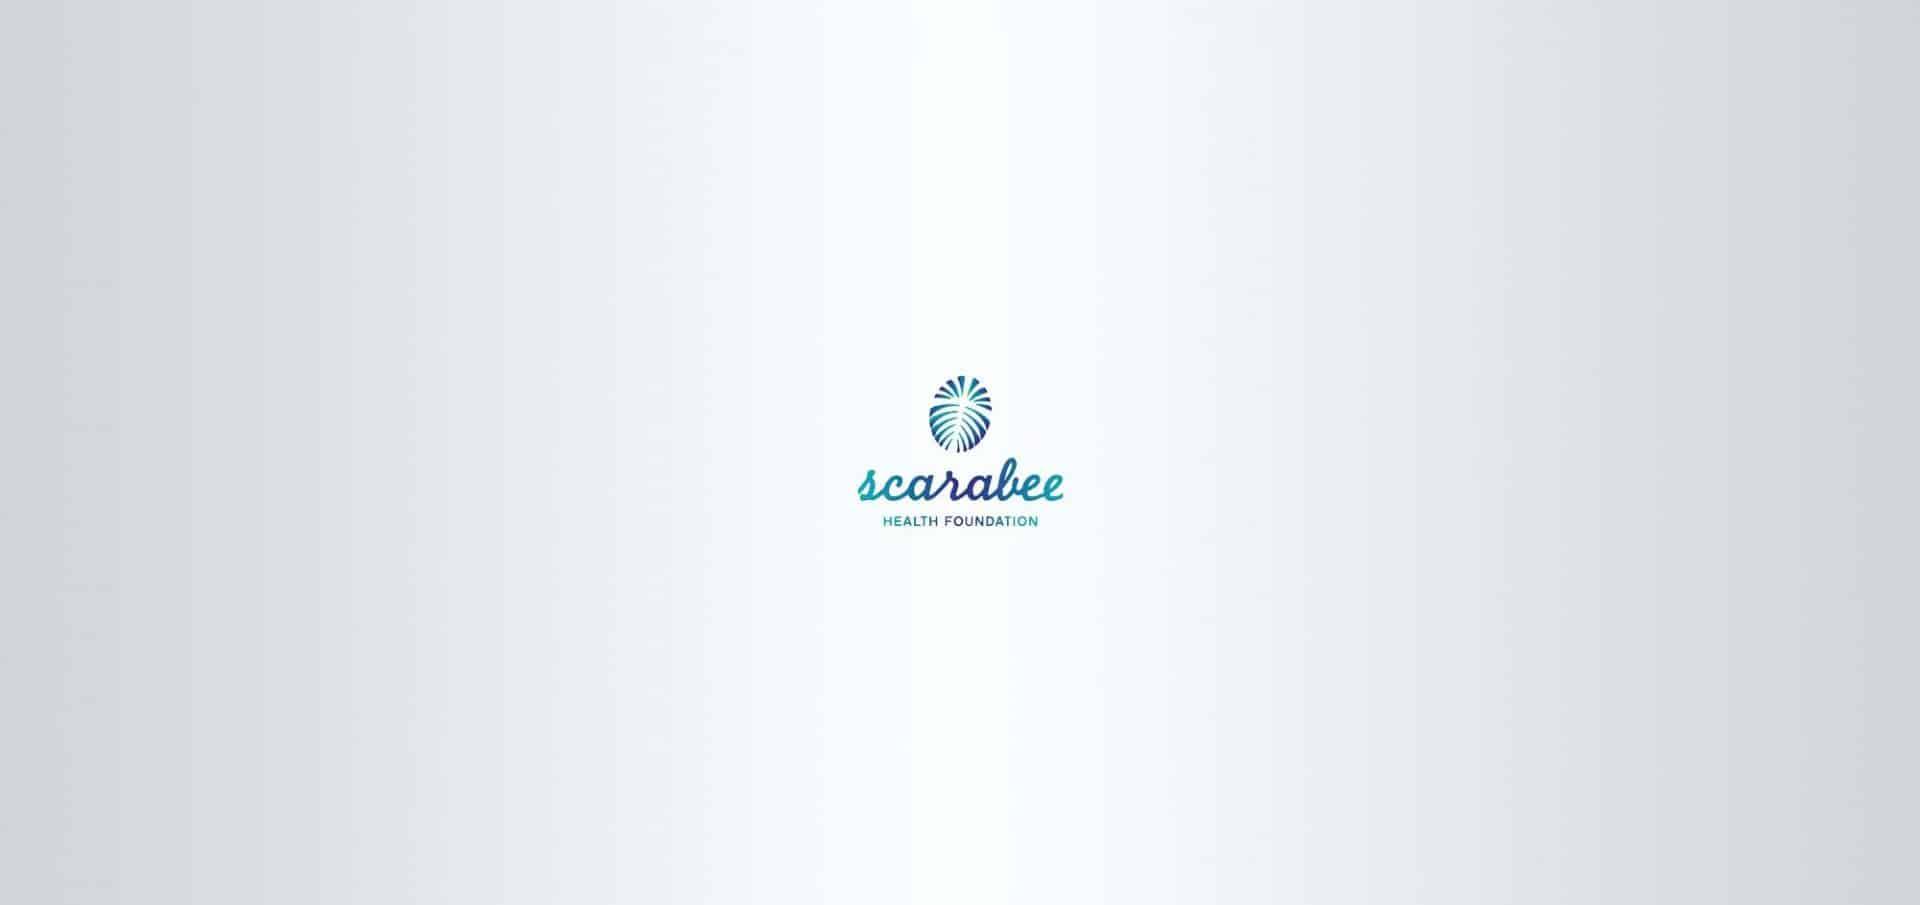 Logo Hasci Scarabee health foundation